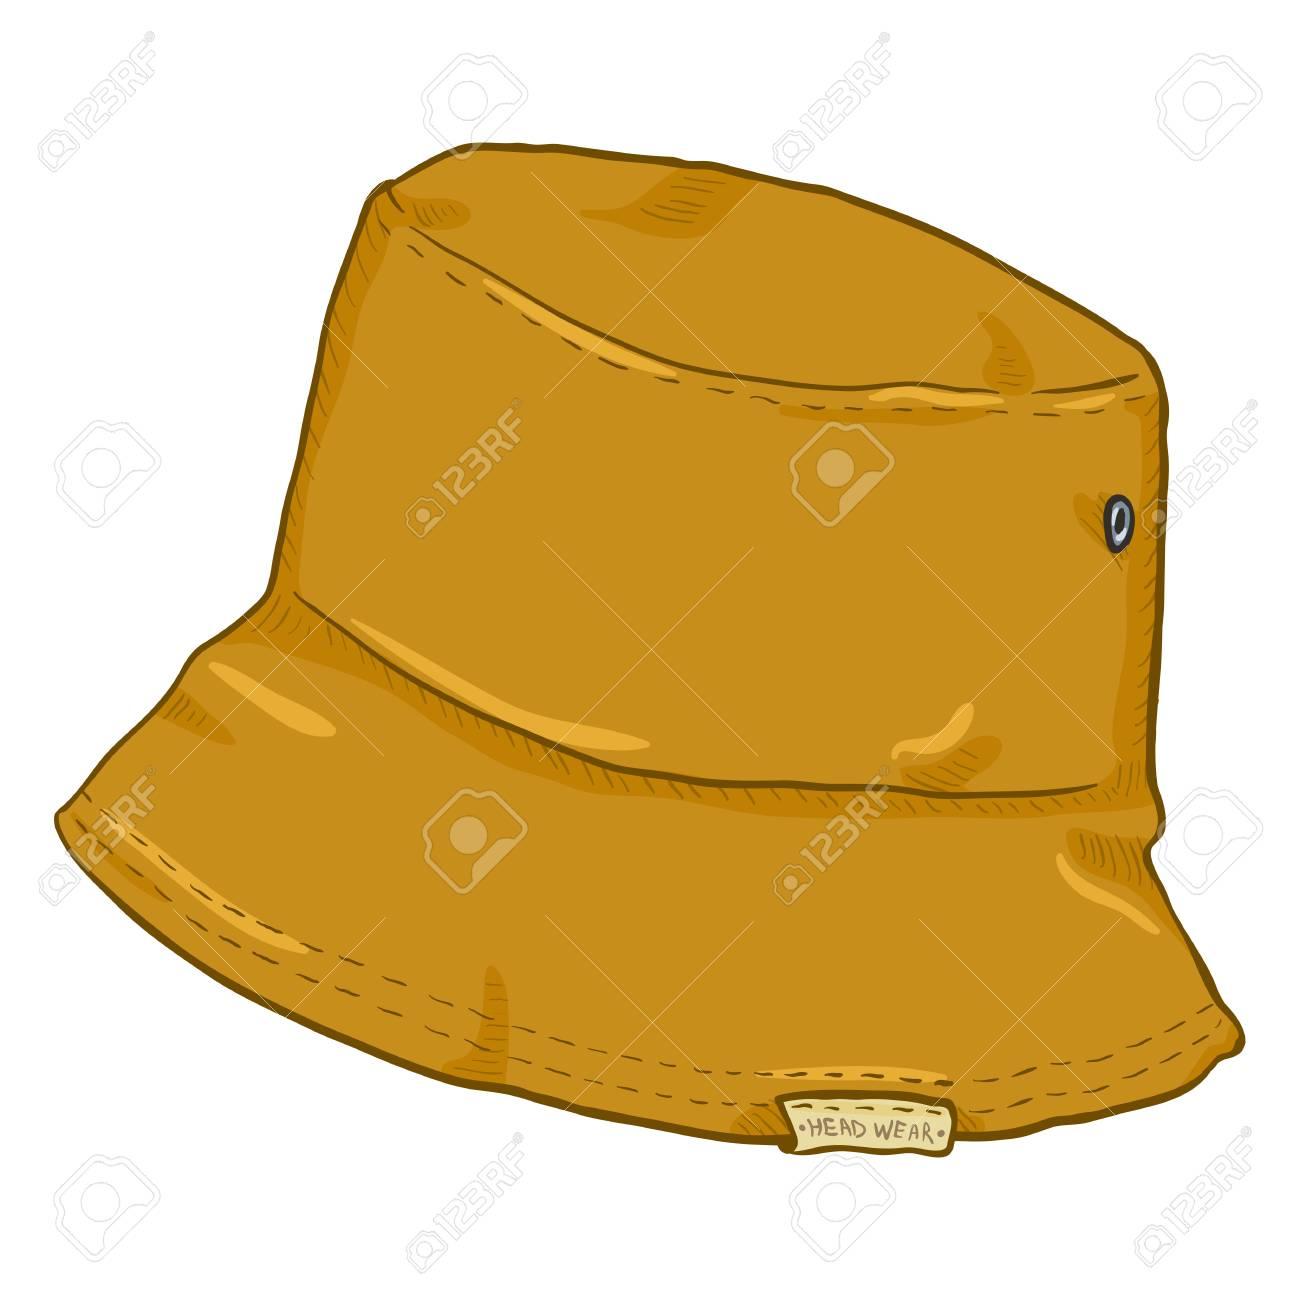 Vector - Vector Single Cartoon Mustard Color Bucket Hat. Urban Street Style. 9ed4b449acb